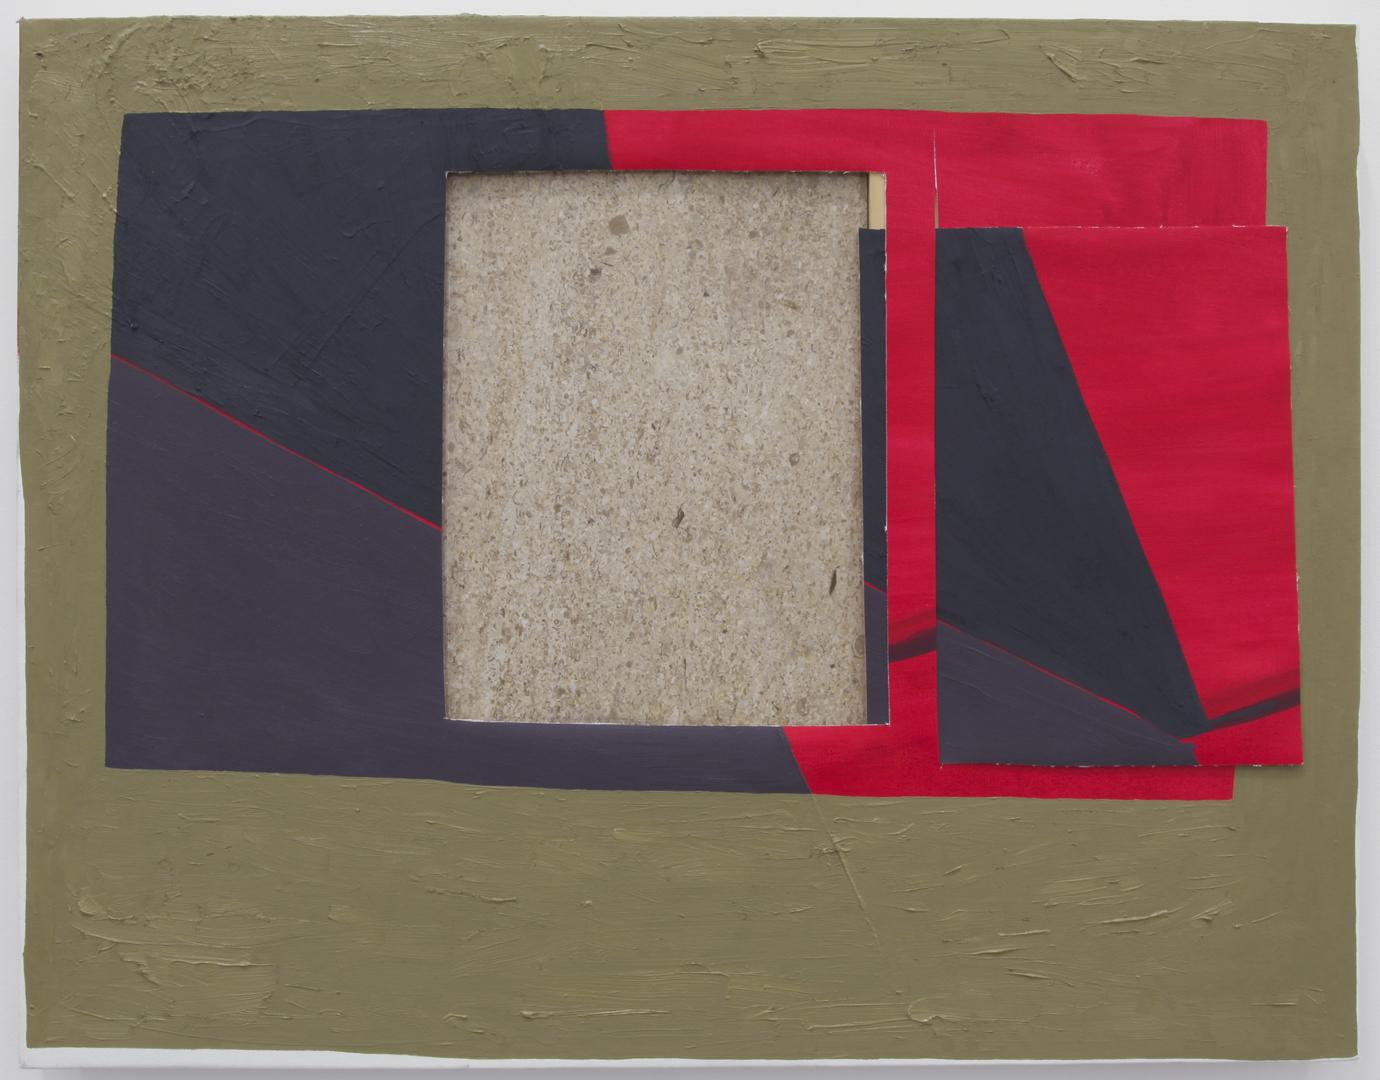 Vertigo, 2011 Oil on canvas with wood and granite 22 x 28 inches